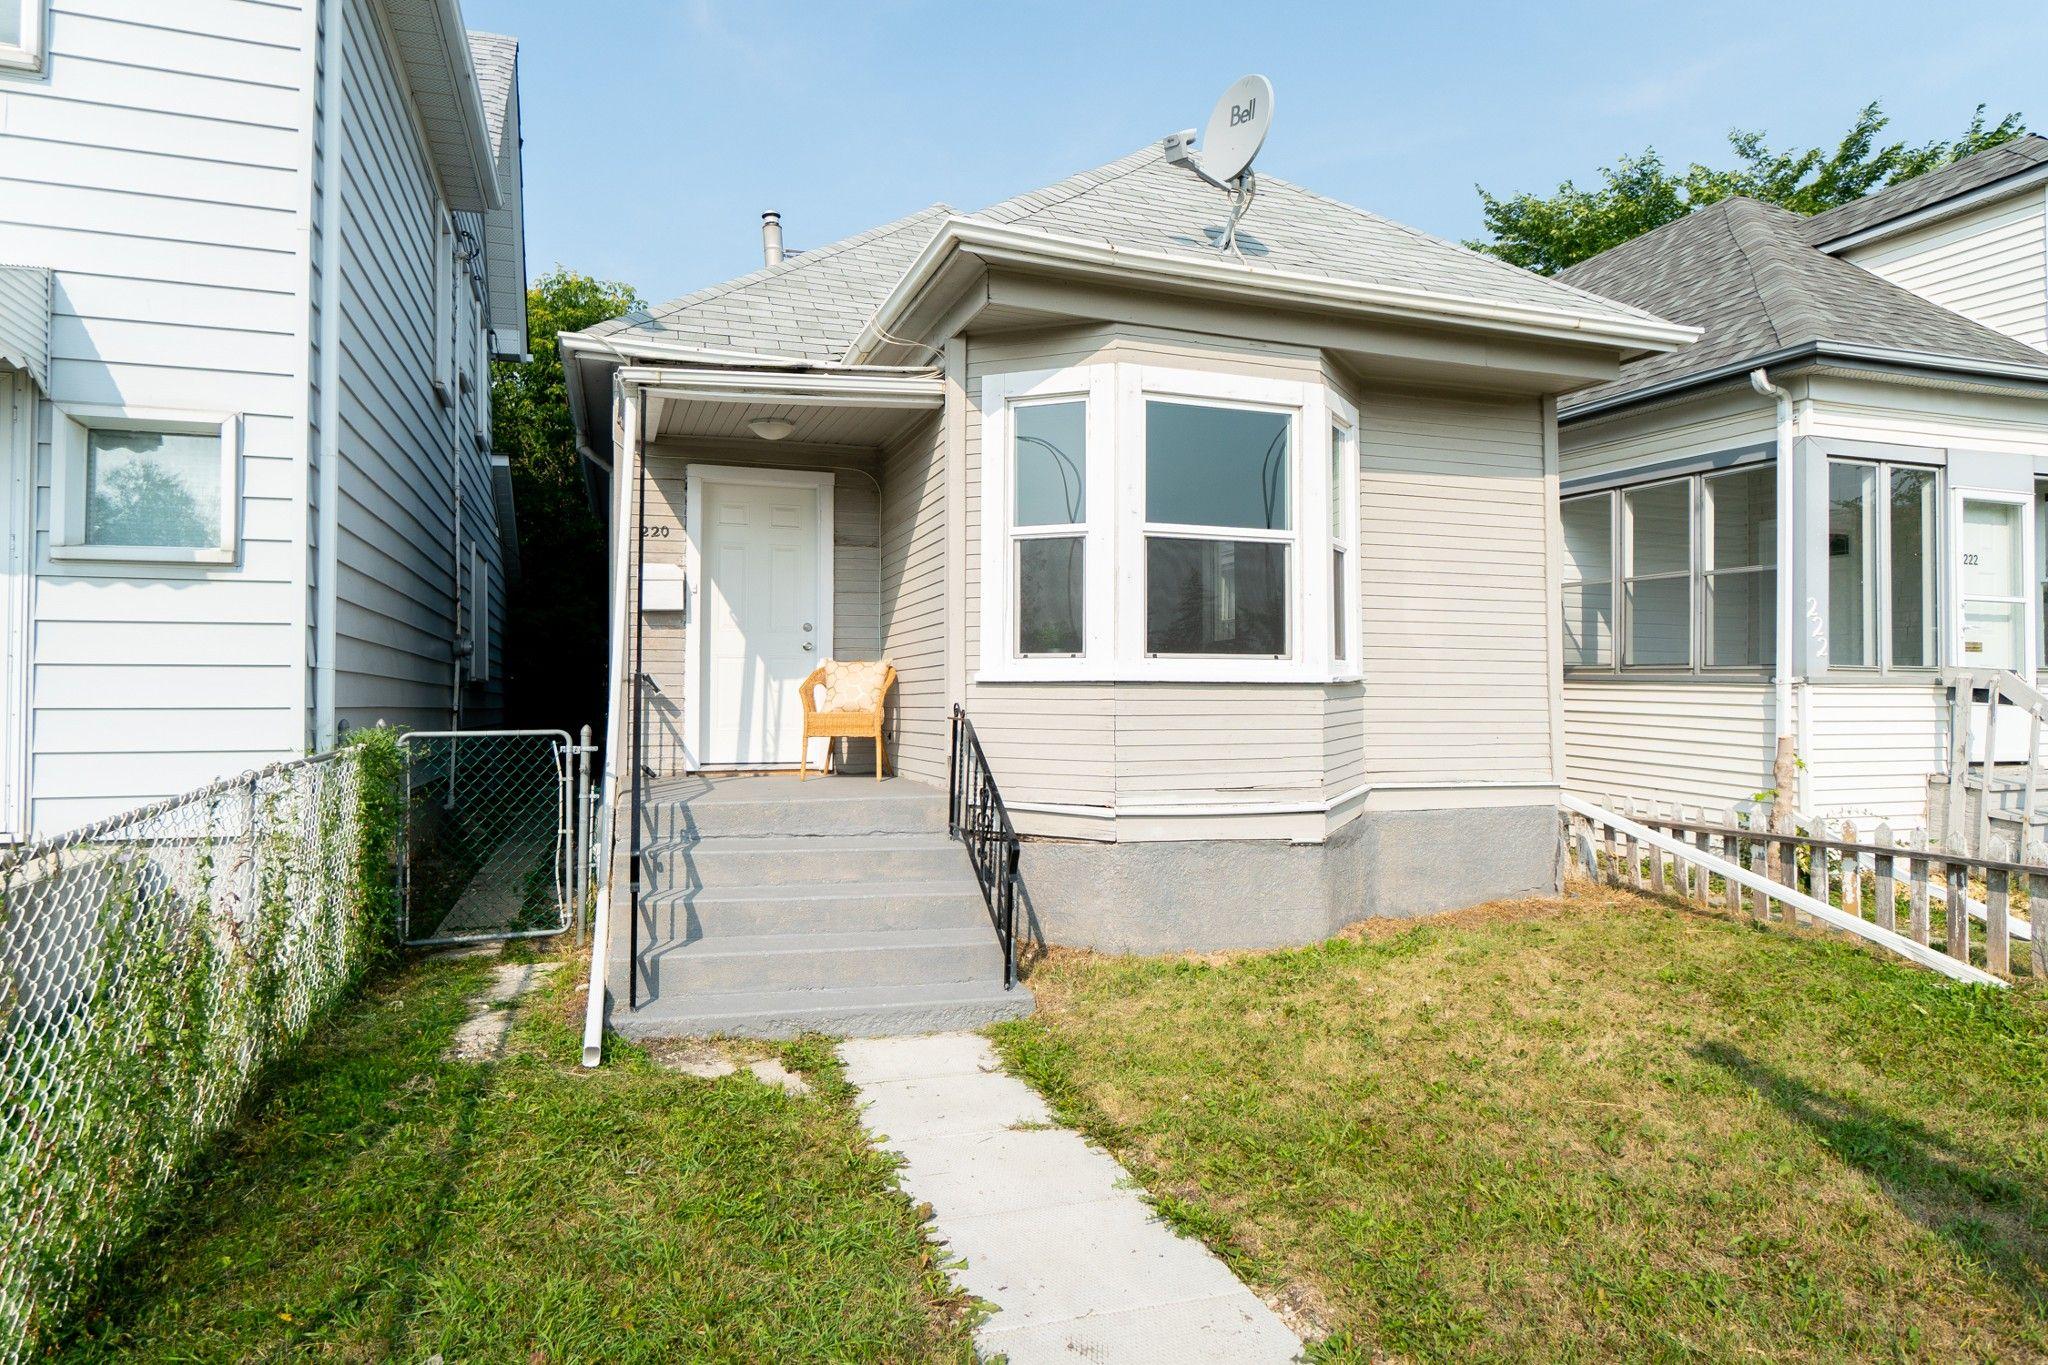 Main Photo: 220 Queen Street in Winnipeg: St James House for sale (5E)  : MLS®# 1823356